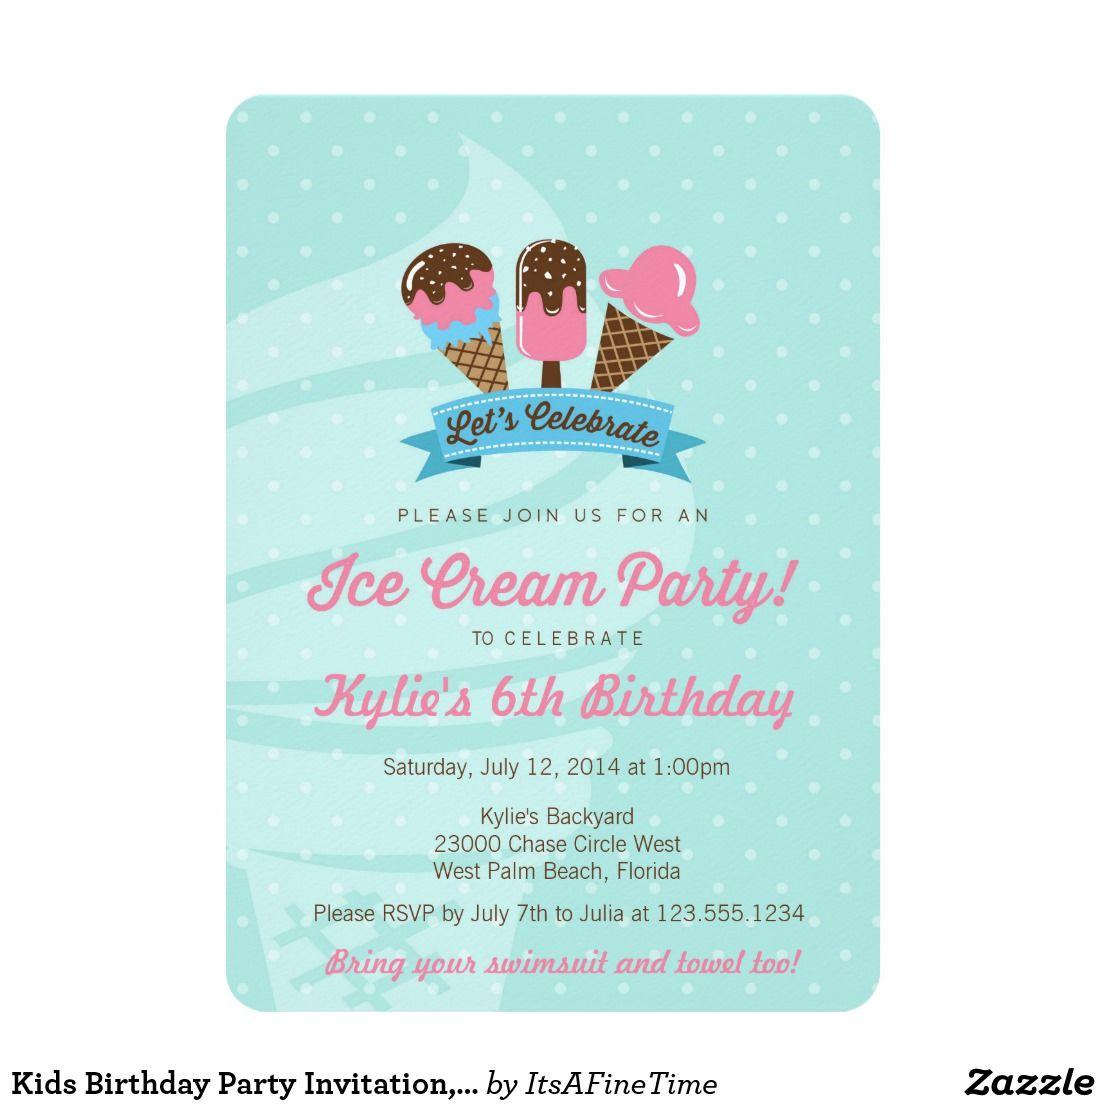 Kids Birthday Party Invitation, Ice Cream Party Card | Kids birthday ...